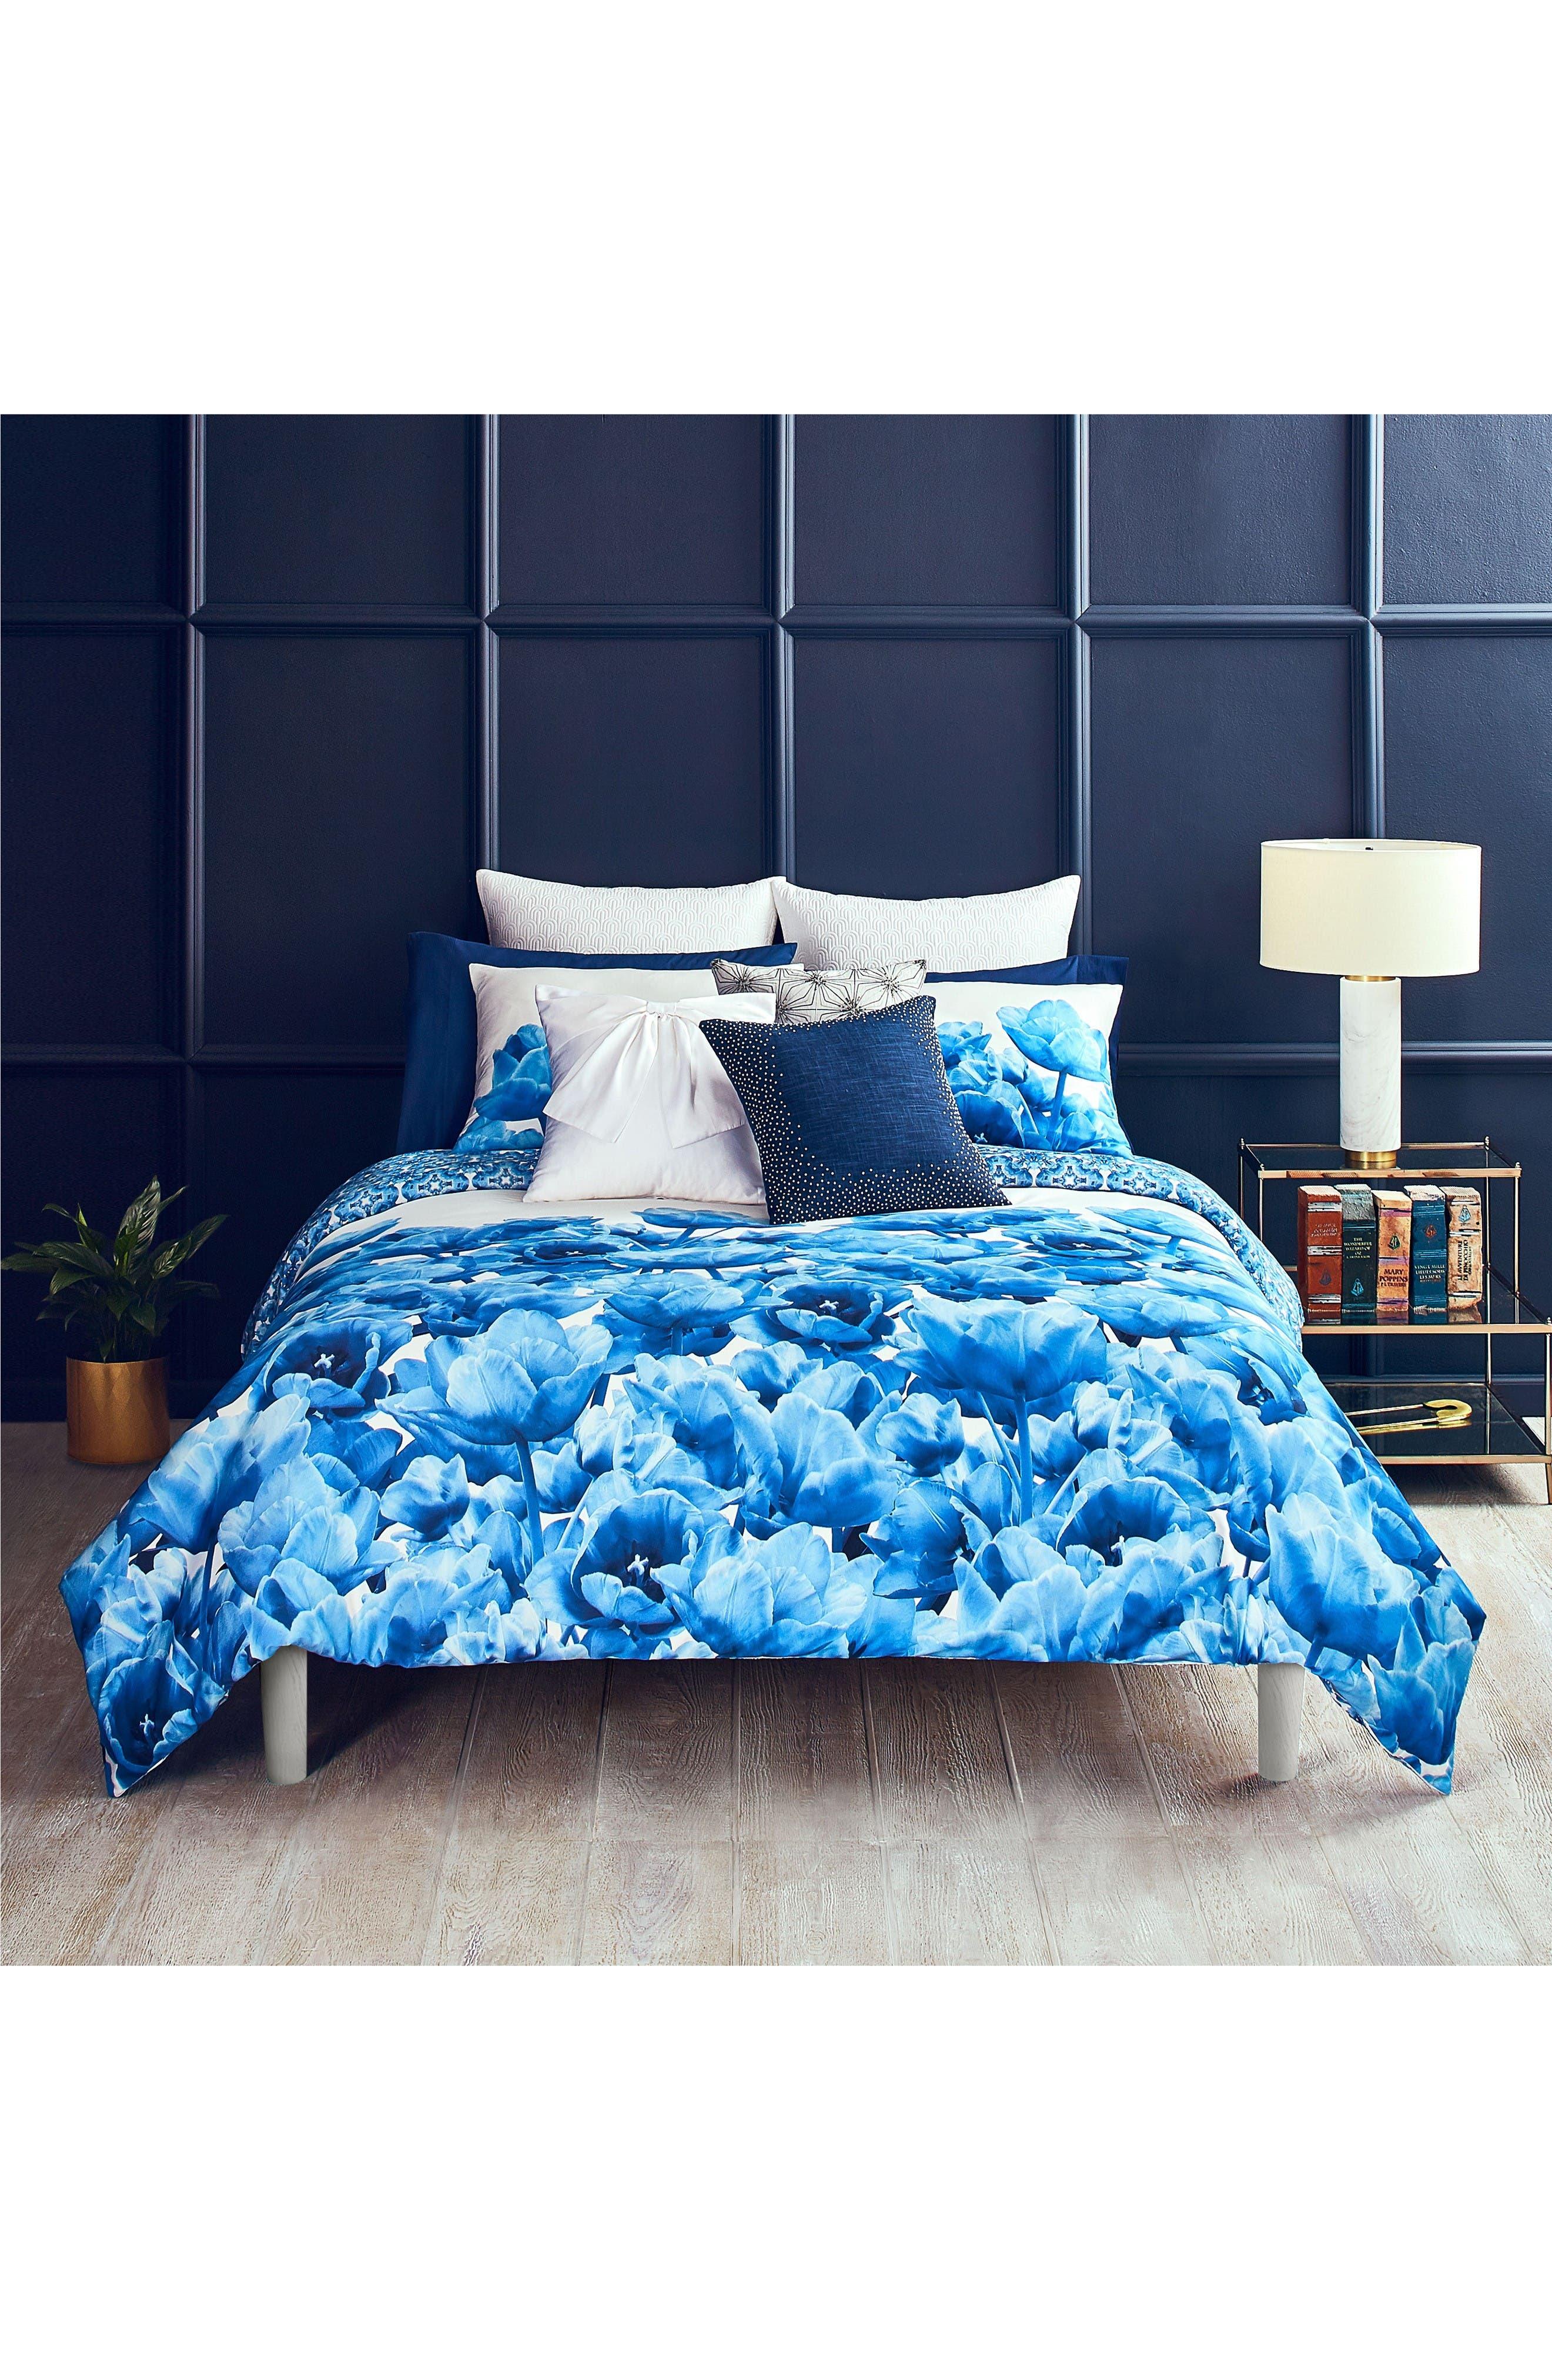 Main Image - Ted Baker London Blue Beauty Comforter & Sham Set